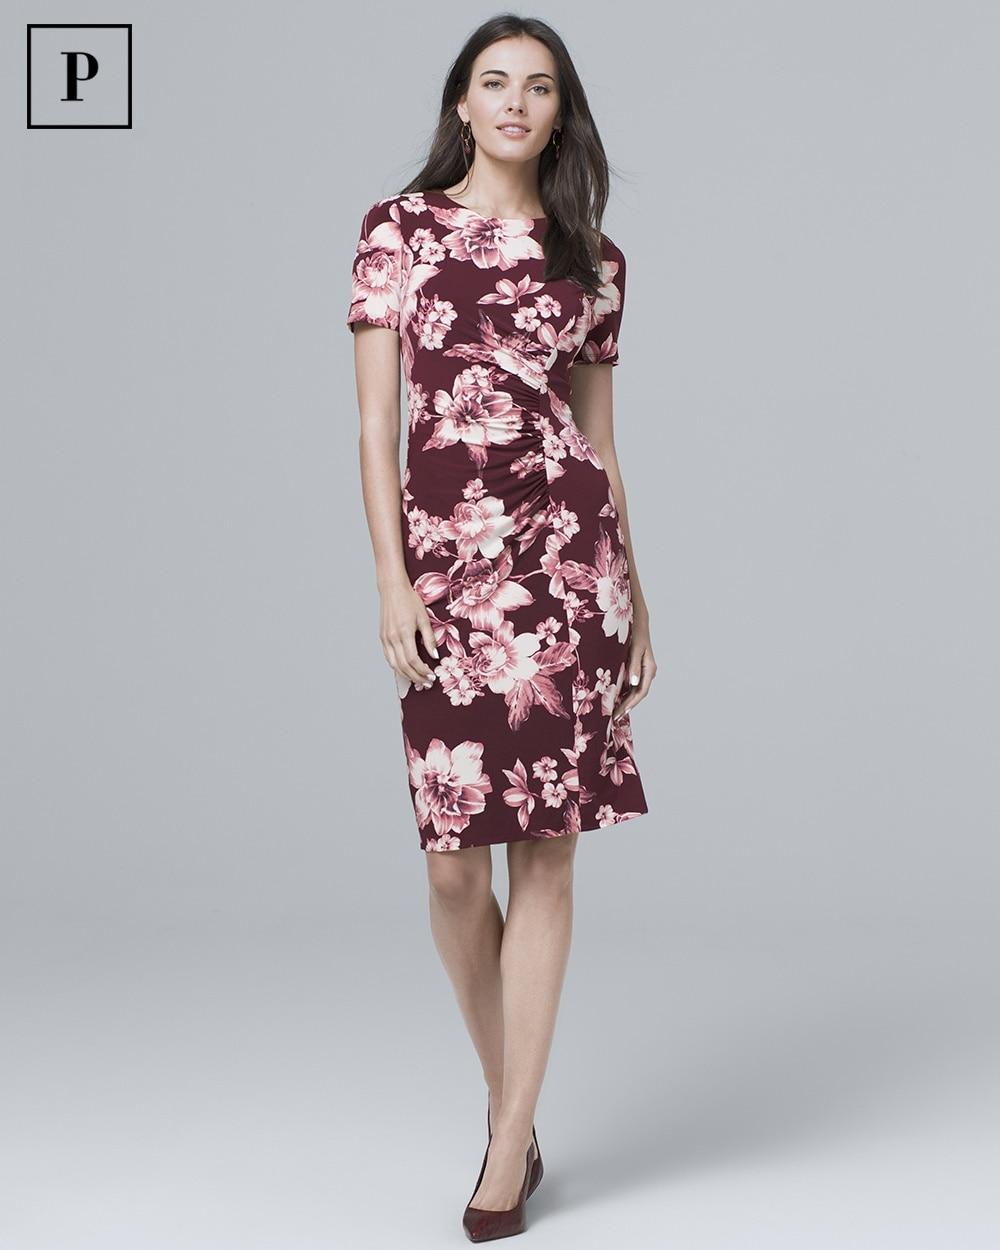 Petite Short Sleeve Floral Knit Sheath Dress White House Black Market